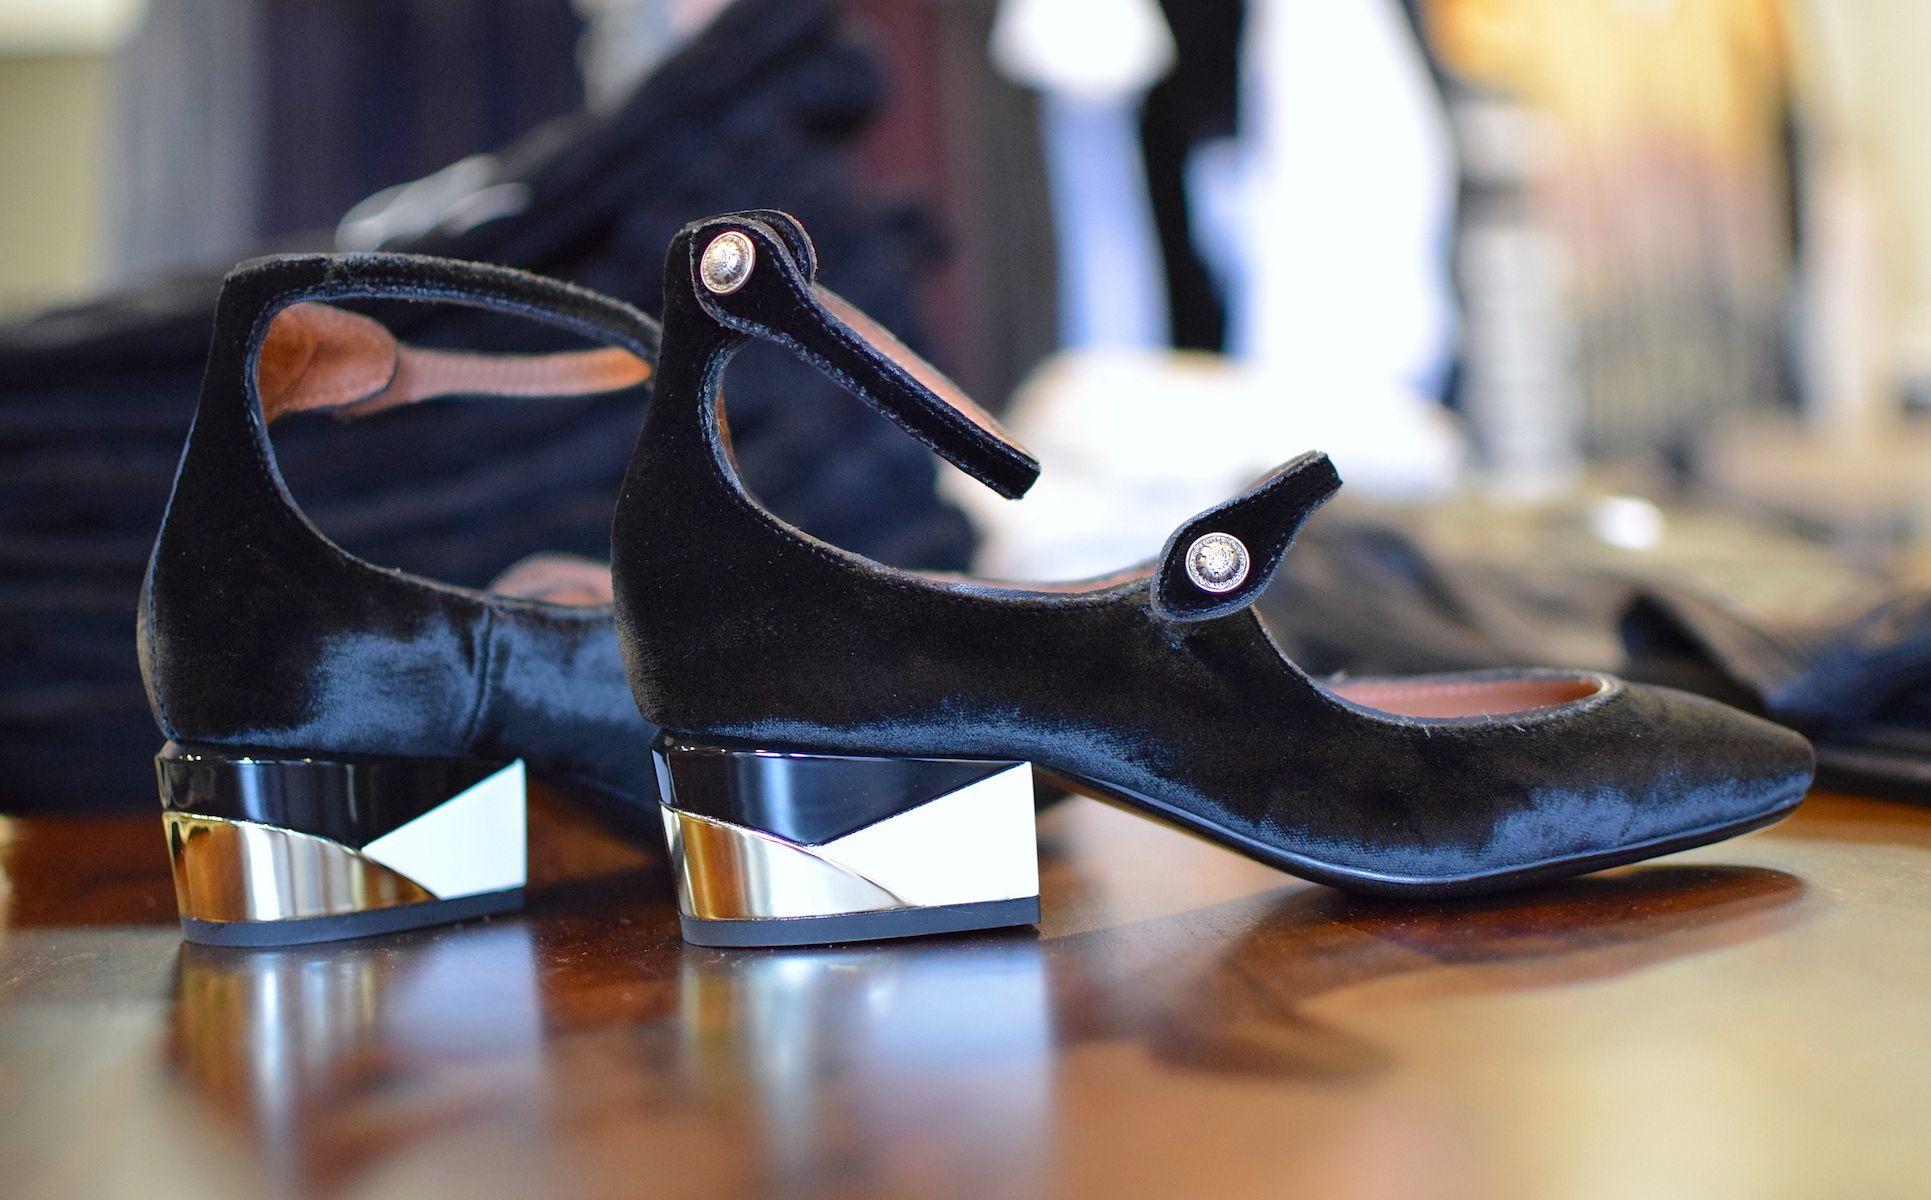 Liliana High Heels Shoes For Sale In San Antonio Tx High Heels Shoes Heels